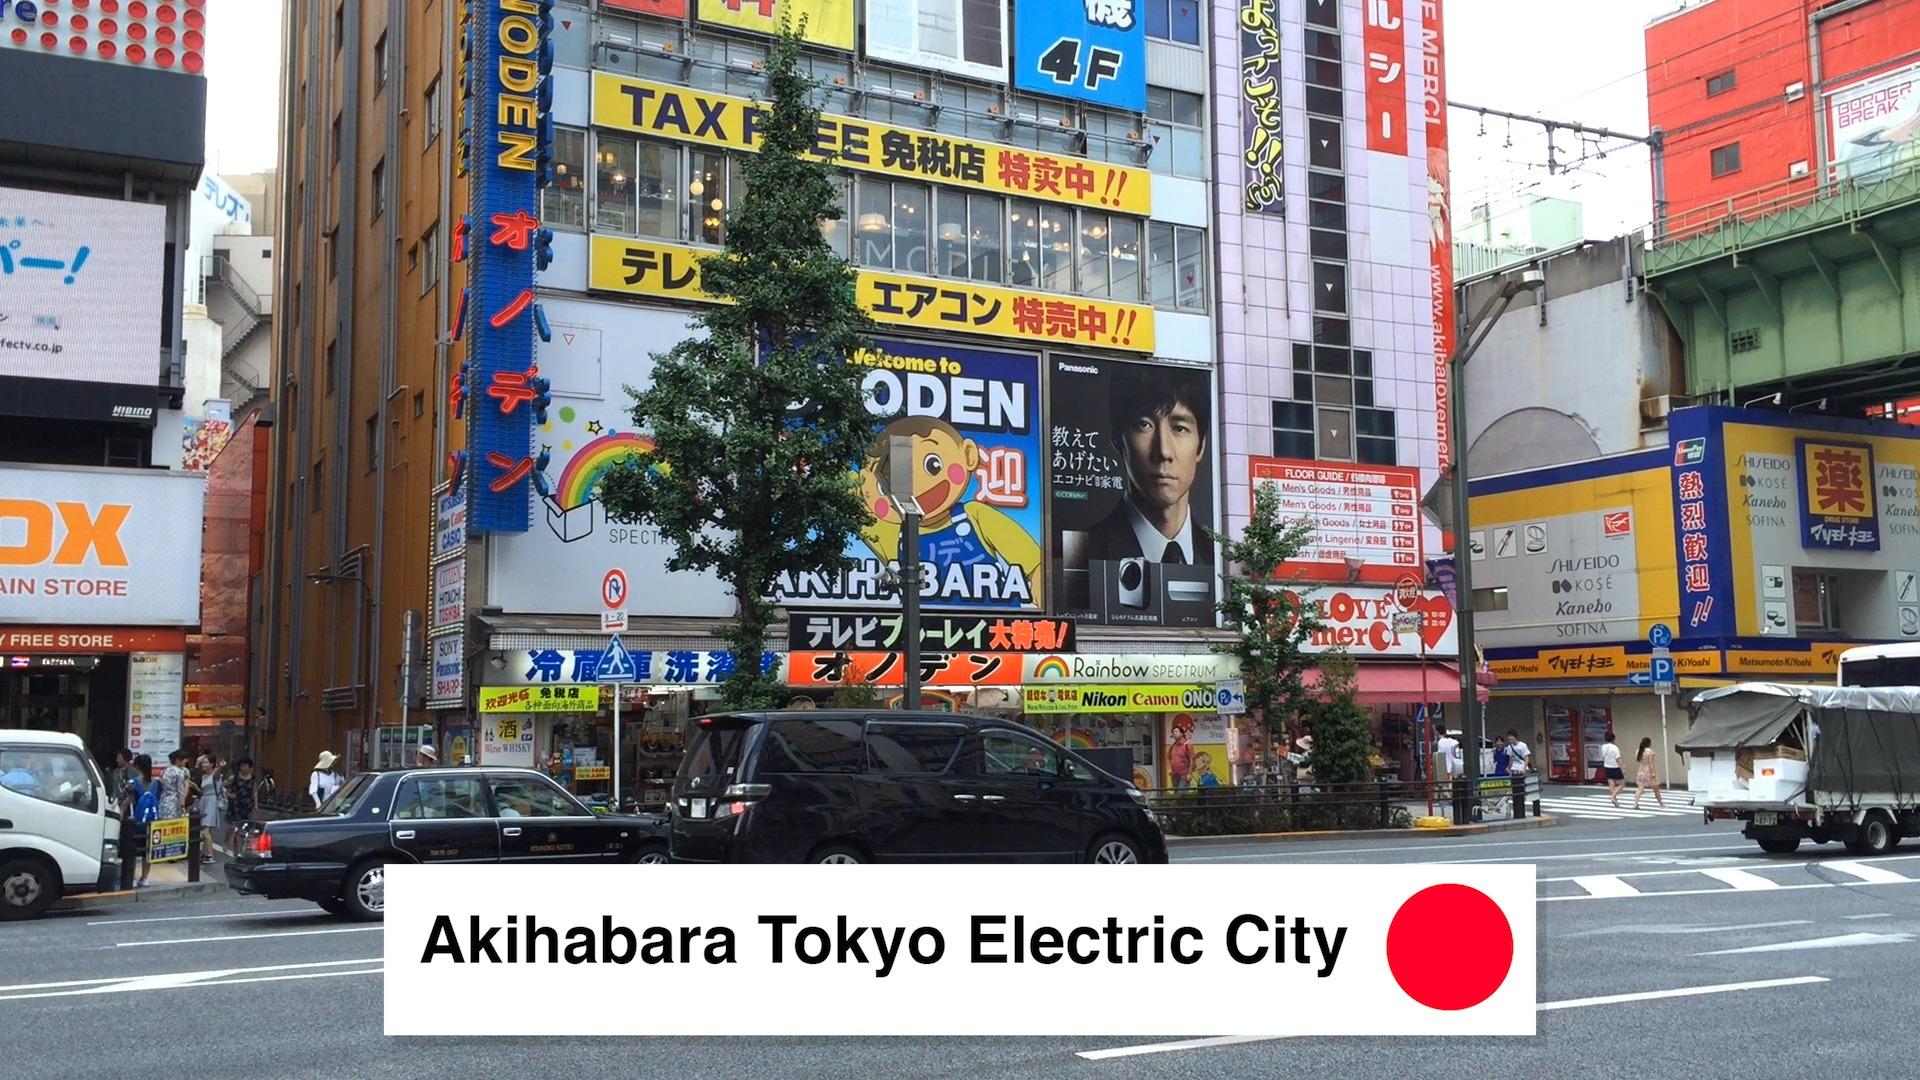 Akihabara Tokyo Electric City - Walking Around Akihabara Tokyo What To Do 2018 - Loot Anime Discount Code 2018 🇯🇵 🏙 📦